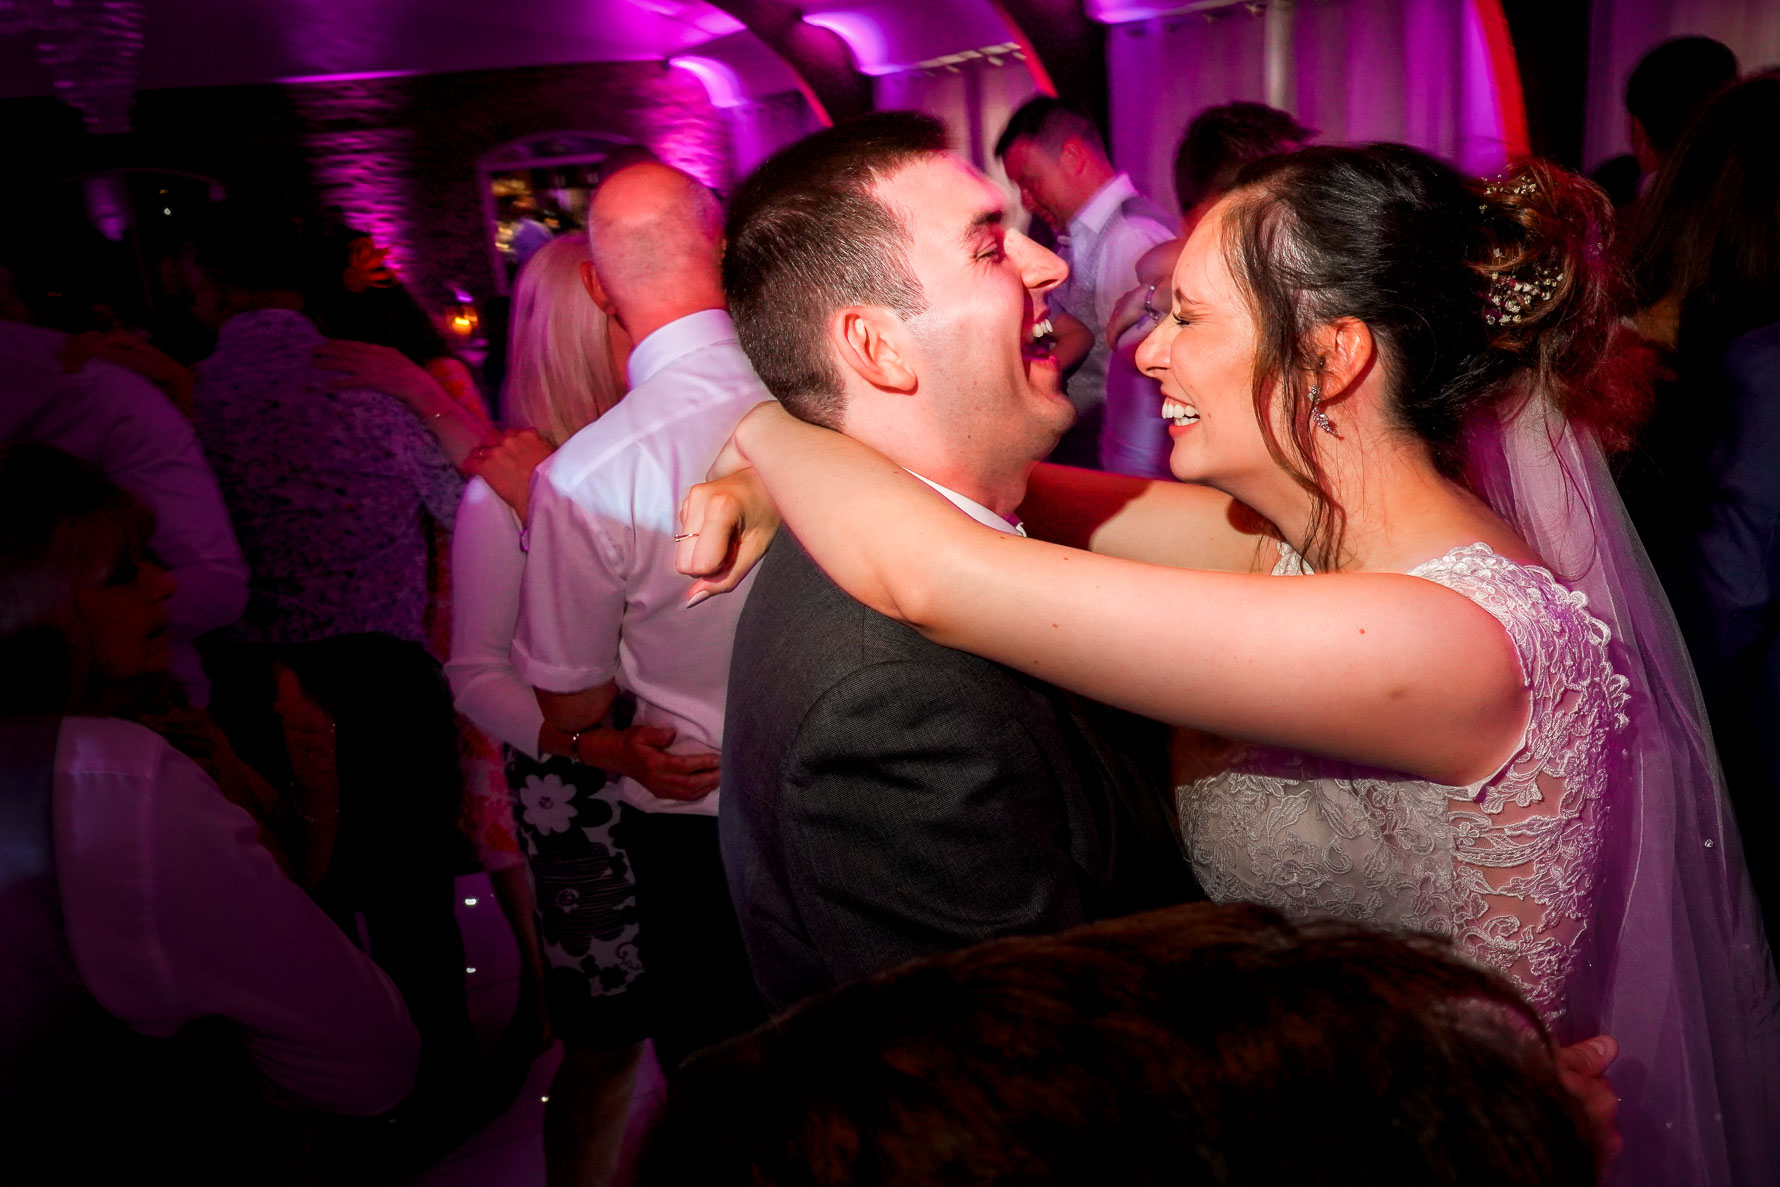 newlyweds in love dancing